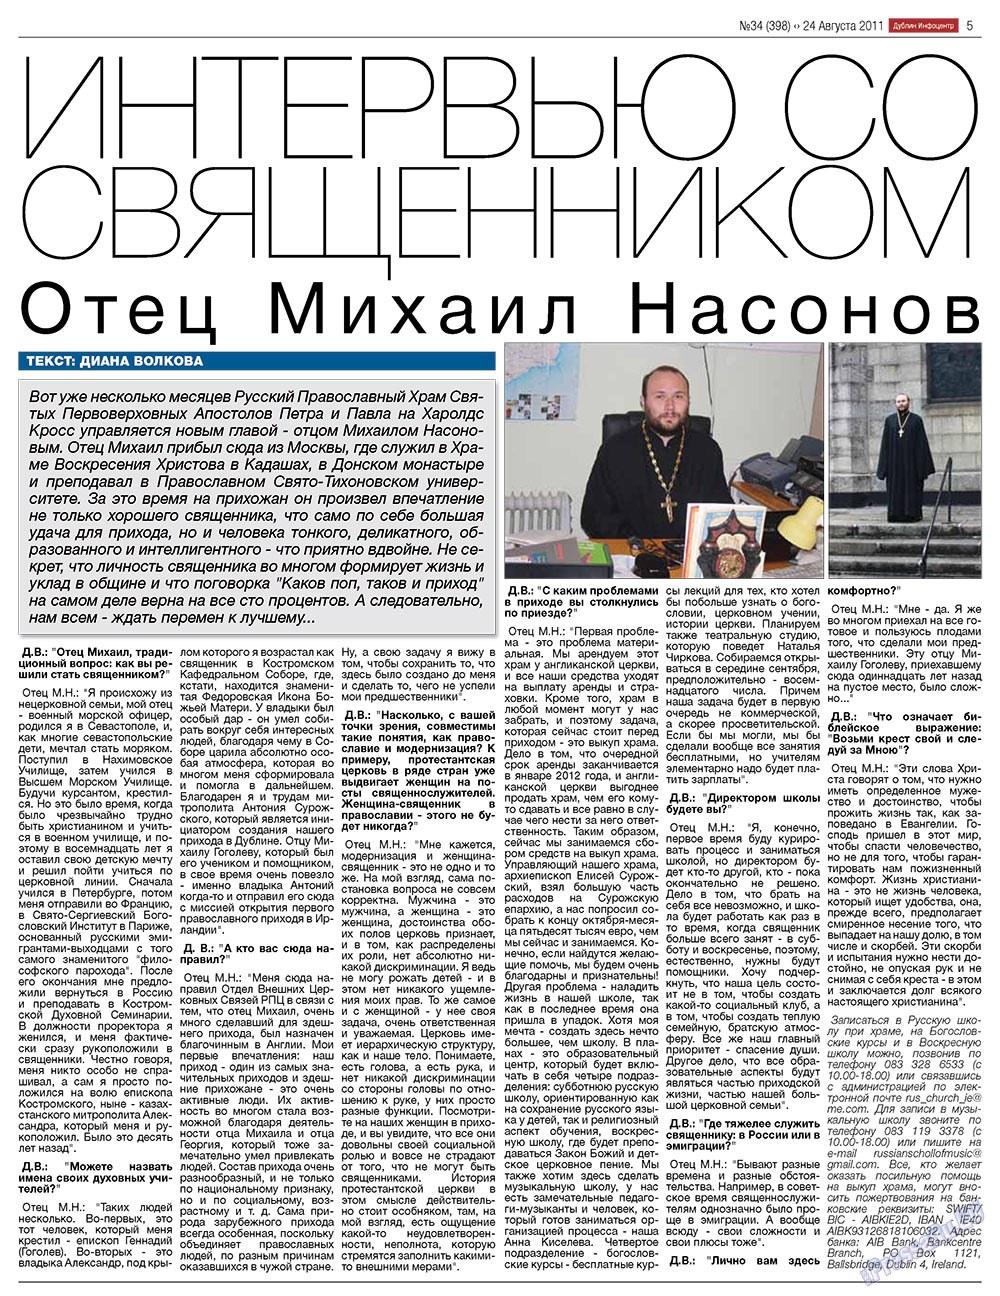 Дублин инфоцентр (газета). 2011 год, номер 34, стр. 5